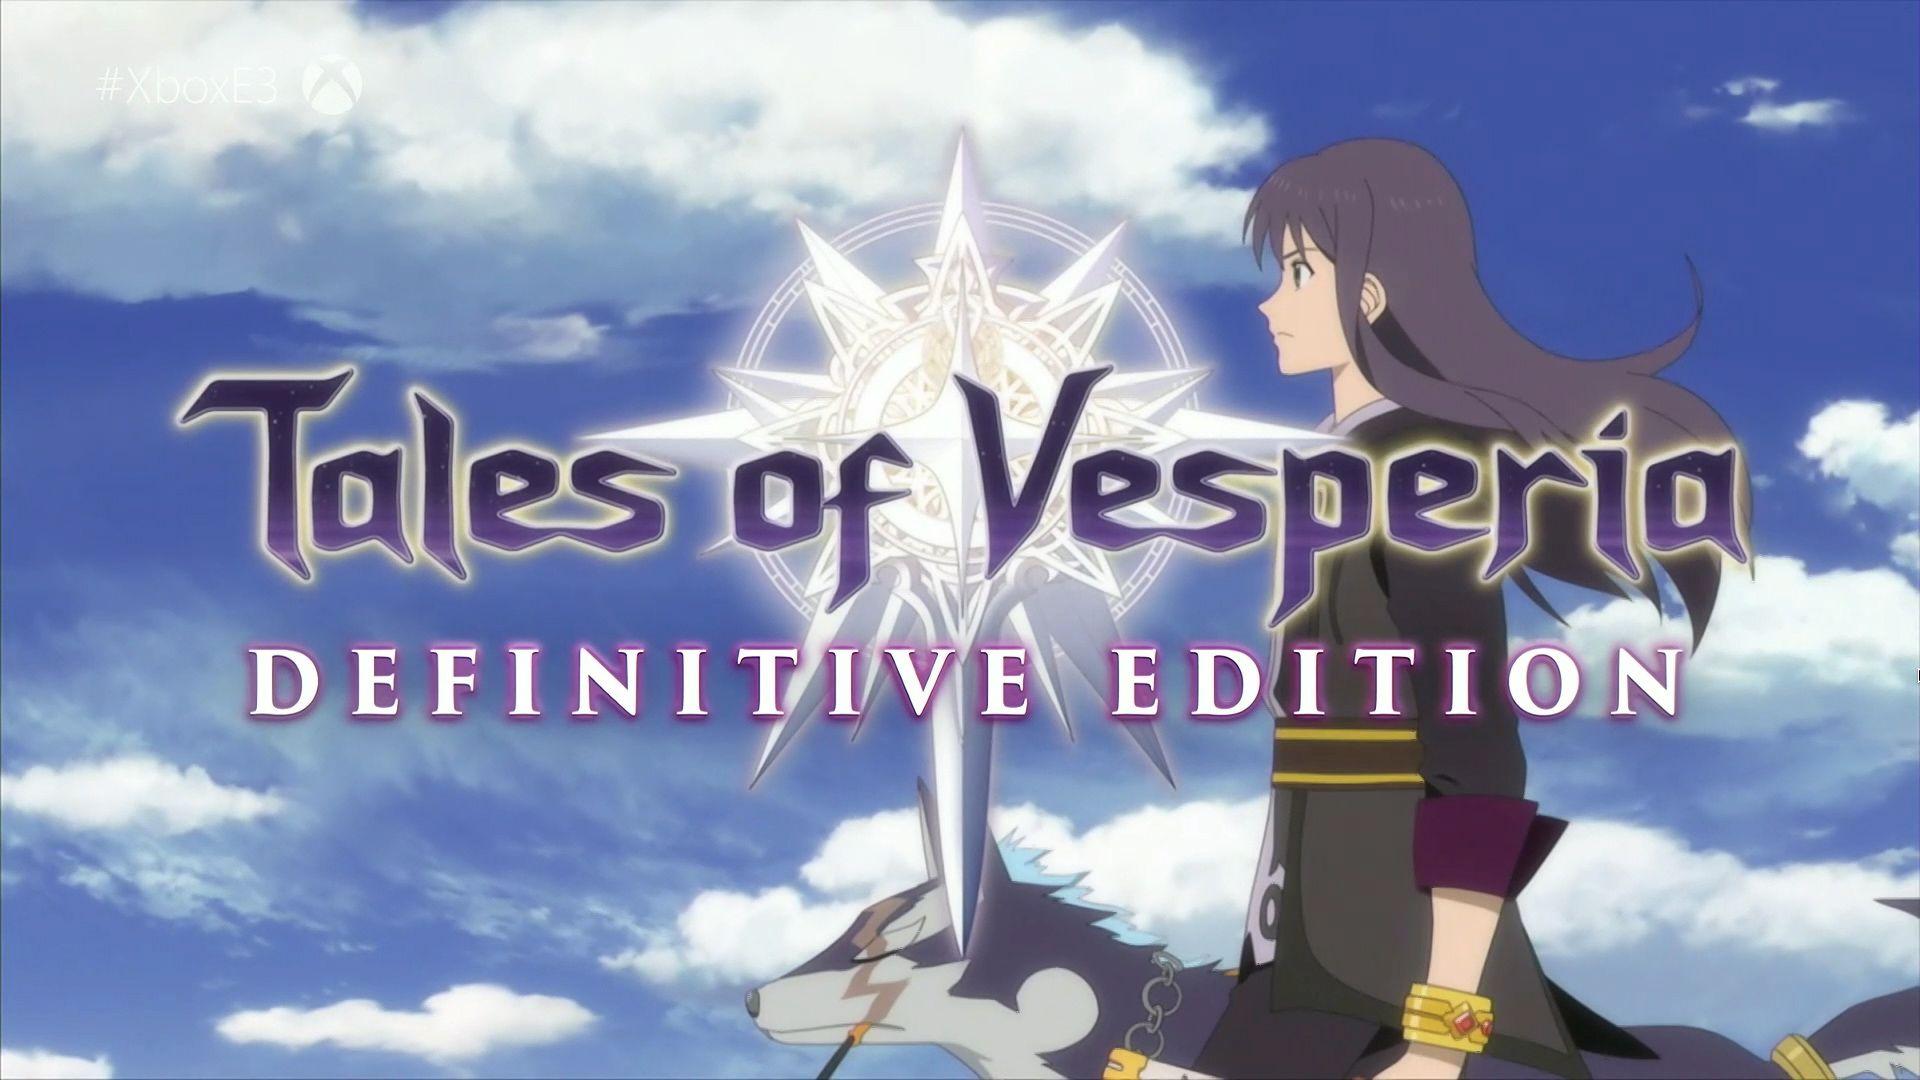 [Crítica] Tales of Vesperia: Definitive Edition